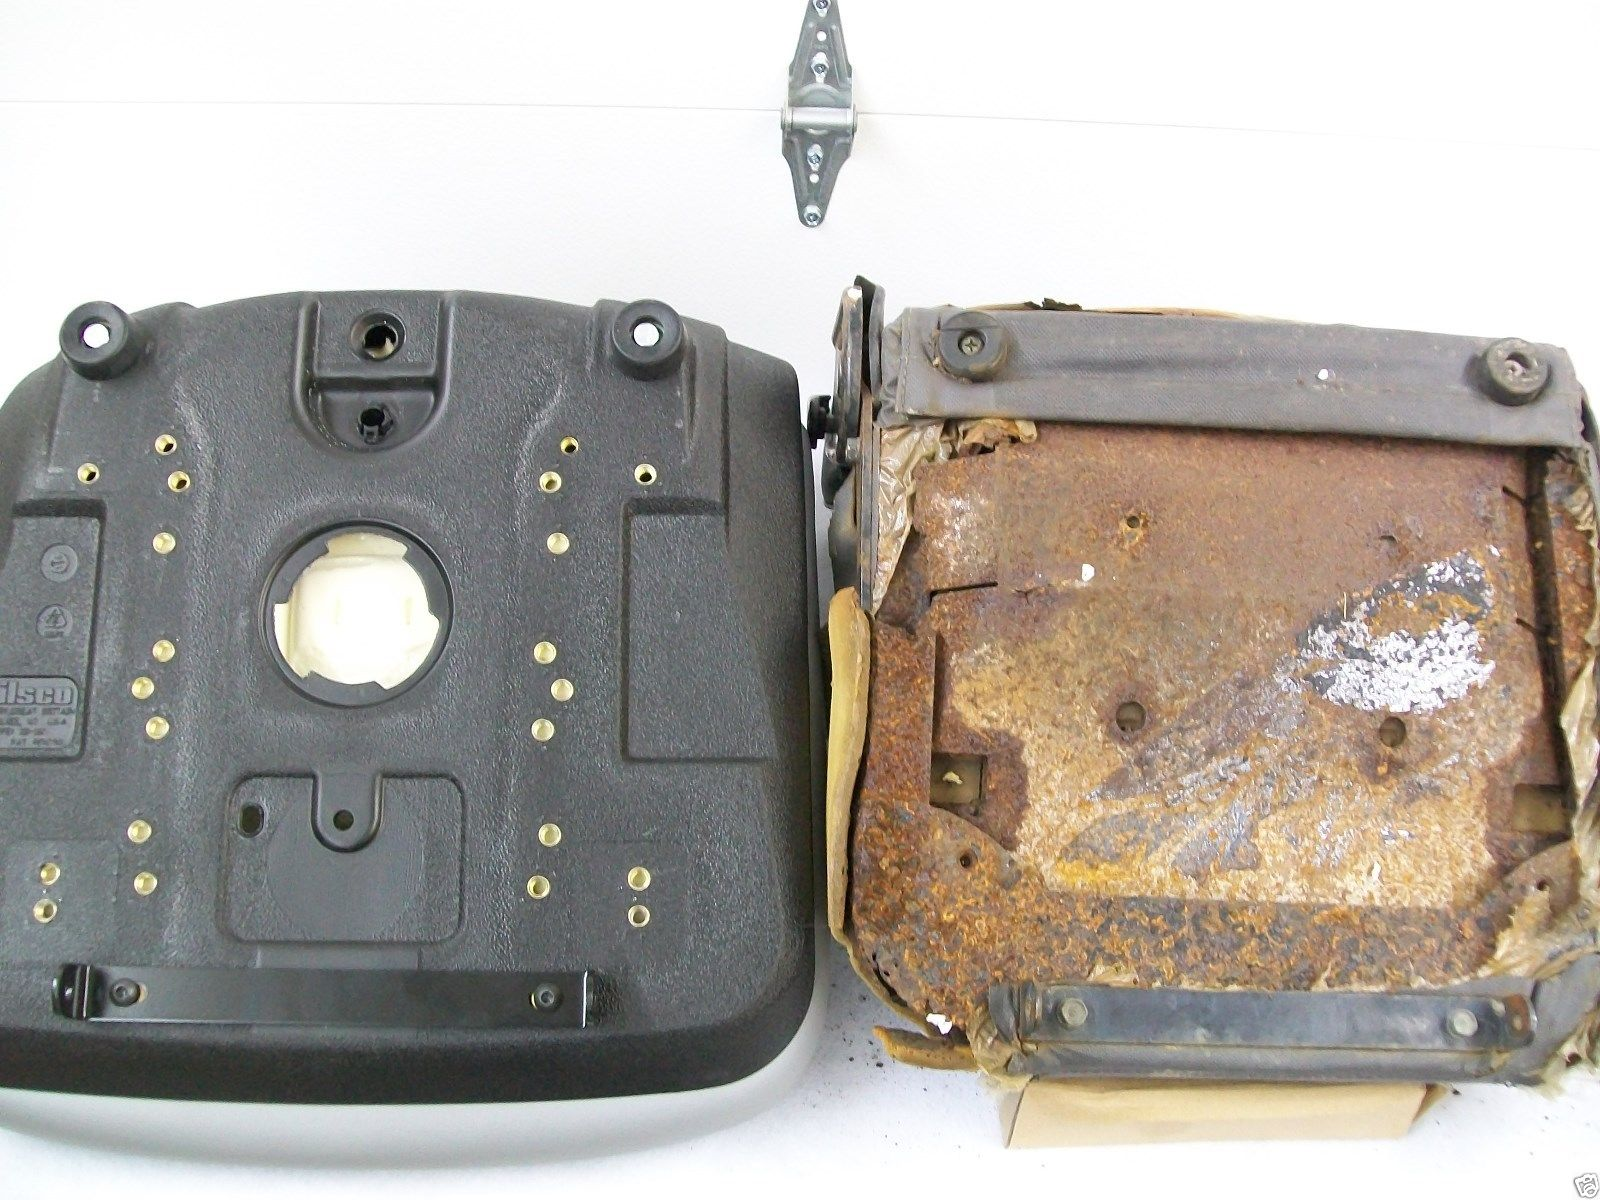 Black Seat Kubota L3010 L3410 L3710 L4310 L4610 Compact Tractor Wiring Diagram L48 Backhoe Kk